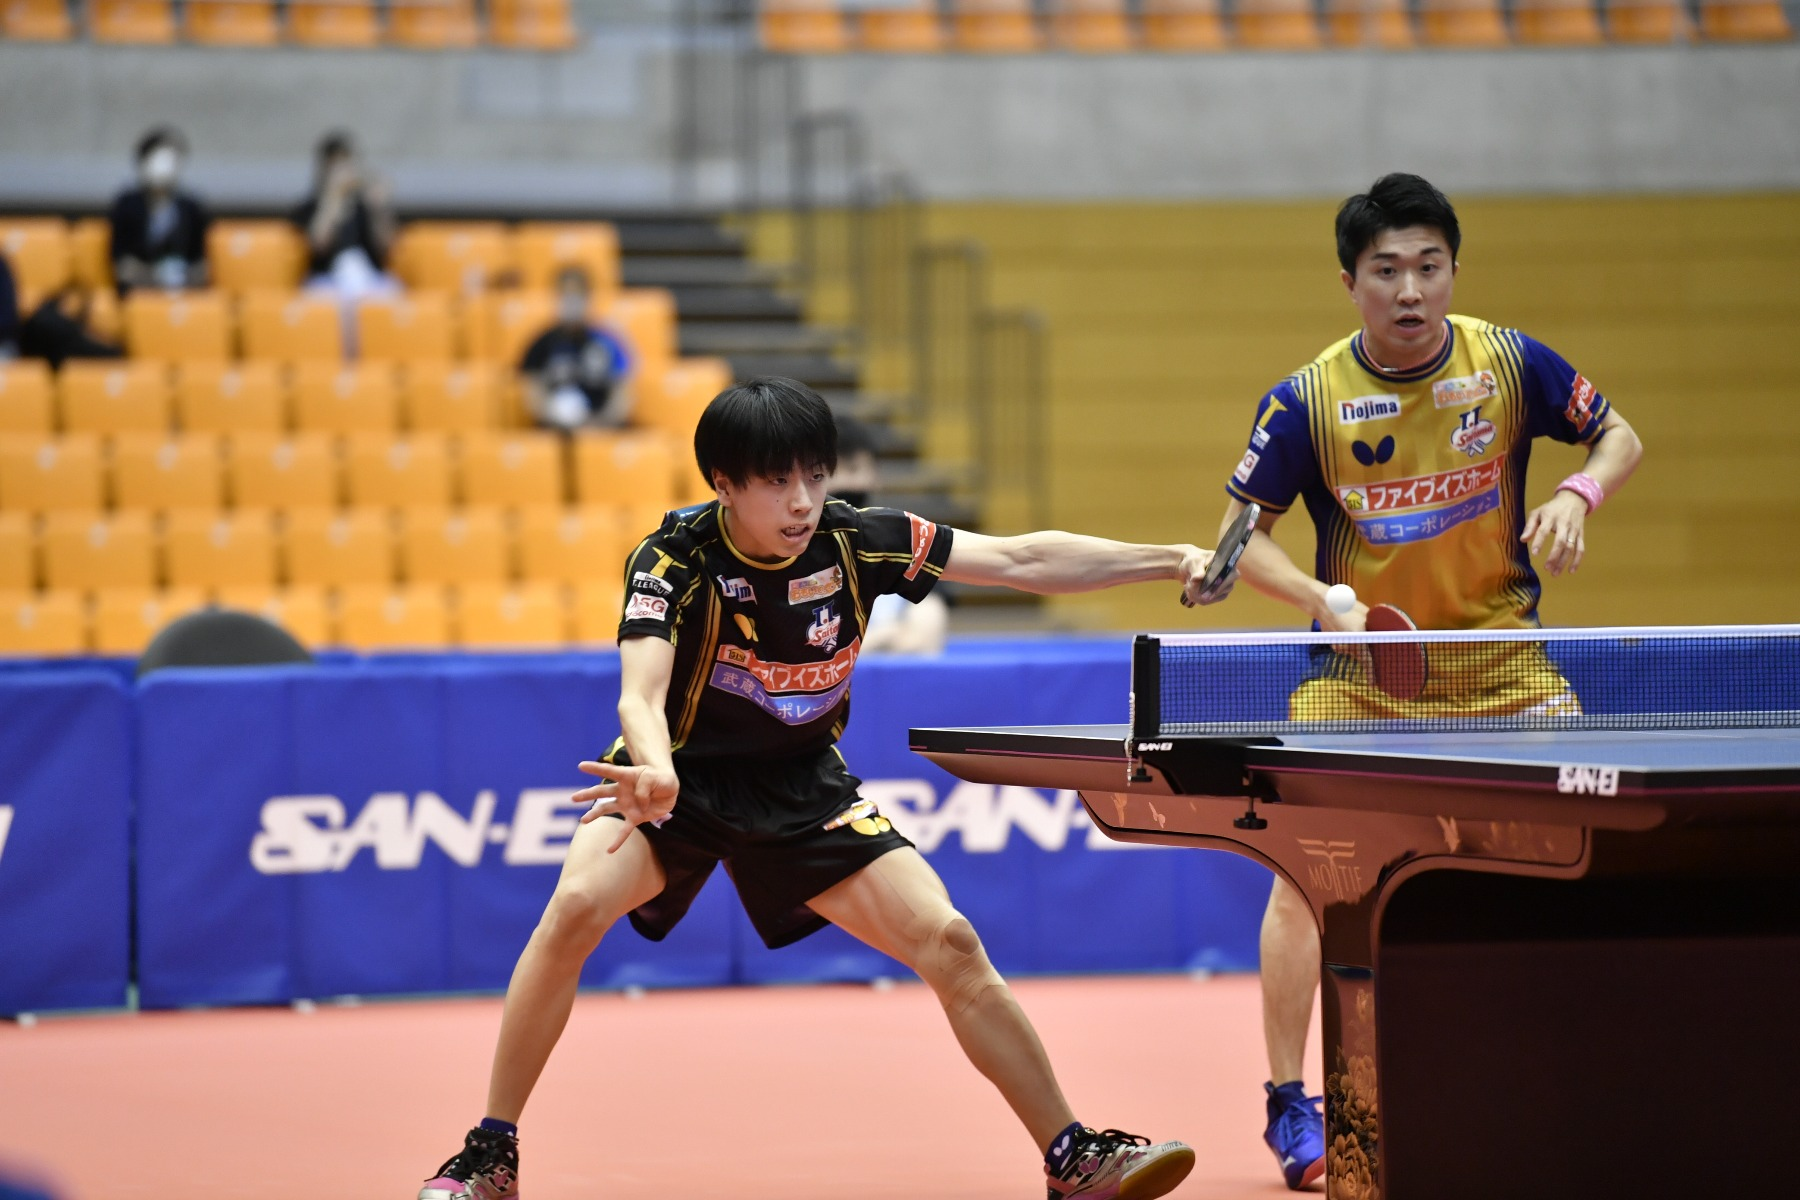 VICTAS ヴィクタス VICTAS PLAY ヴィクタスプレイ 卓球 VICTAS JOURNAL 東京五輪壮行試合、2021卓球NIPPONドリームマッチが開催。水谷・張本ペアが登場